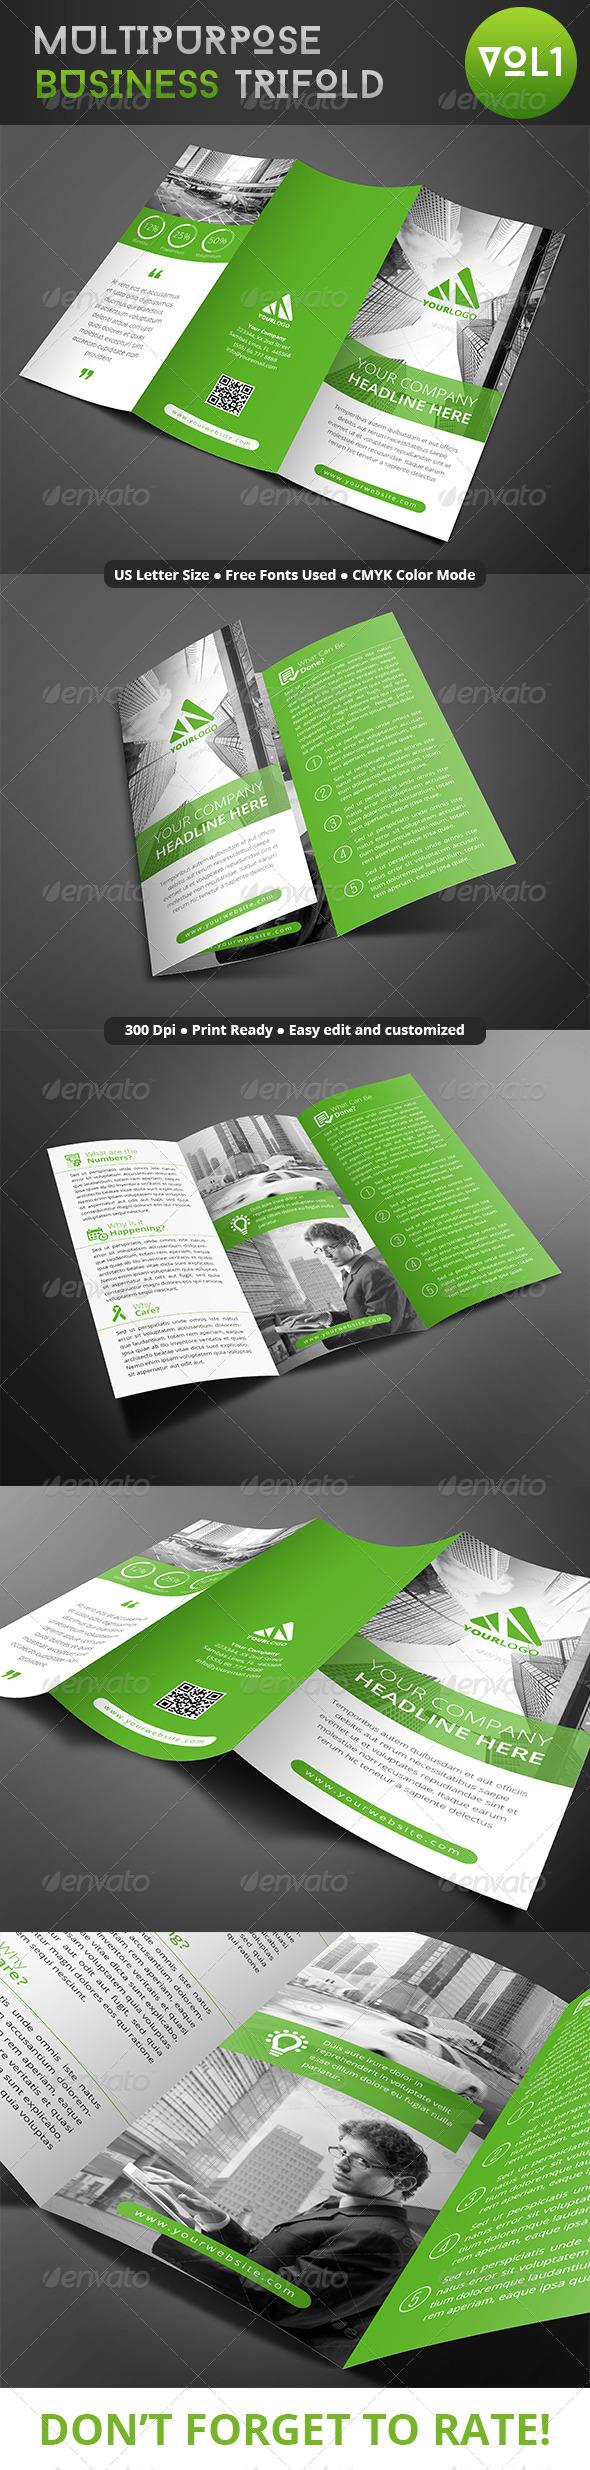 GraphicRiver Multipurpose Business Trifold 8047740